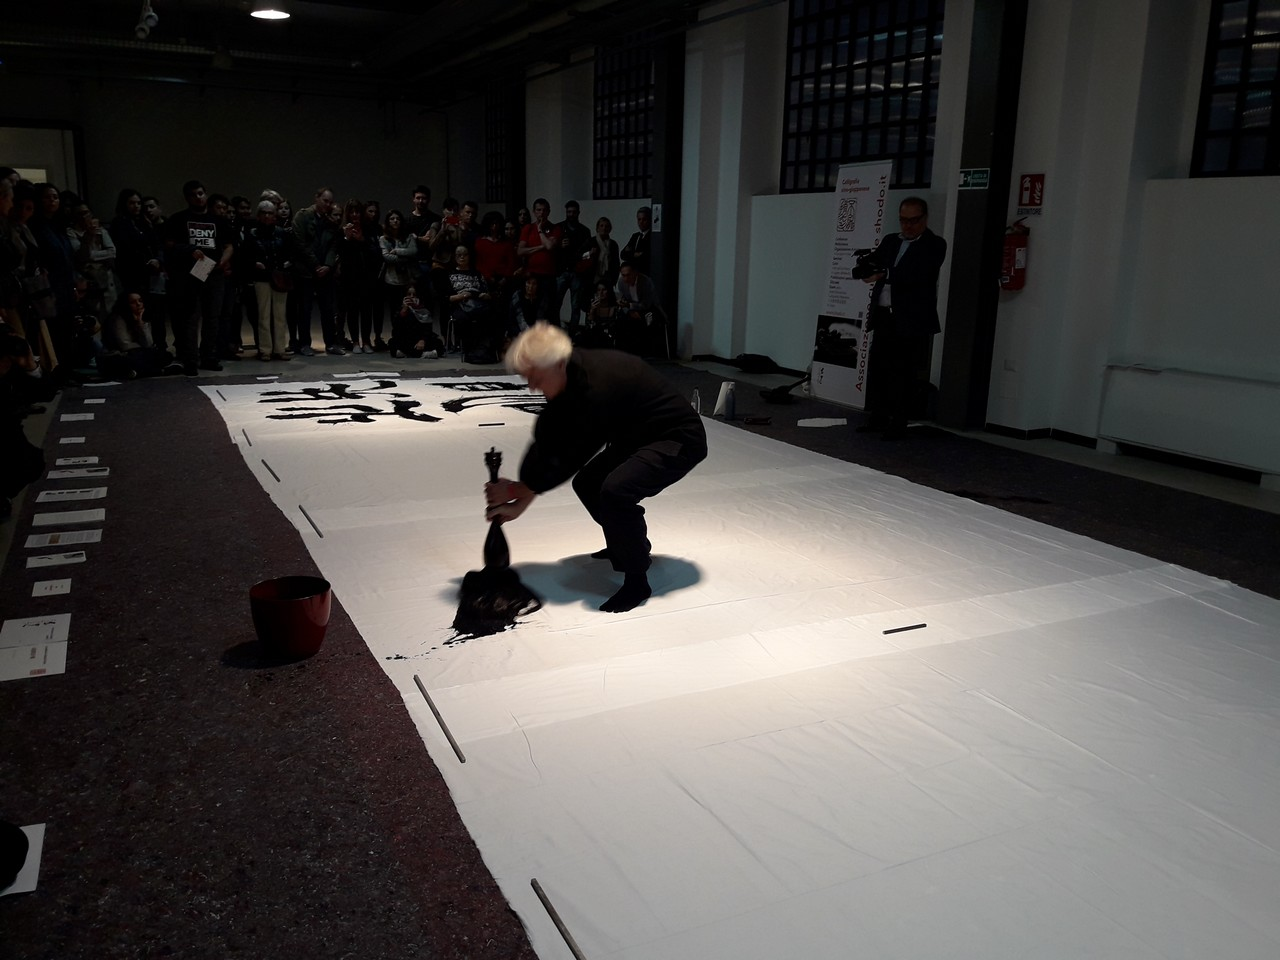 JapanFestival-Milano2018-fotoPagineZeni_028